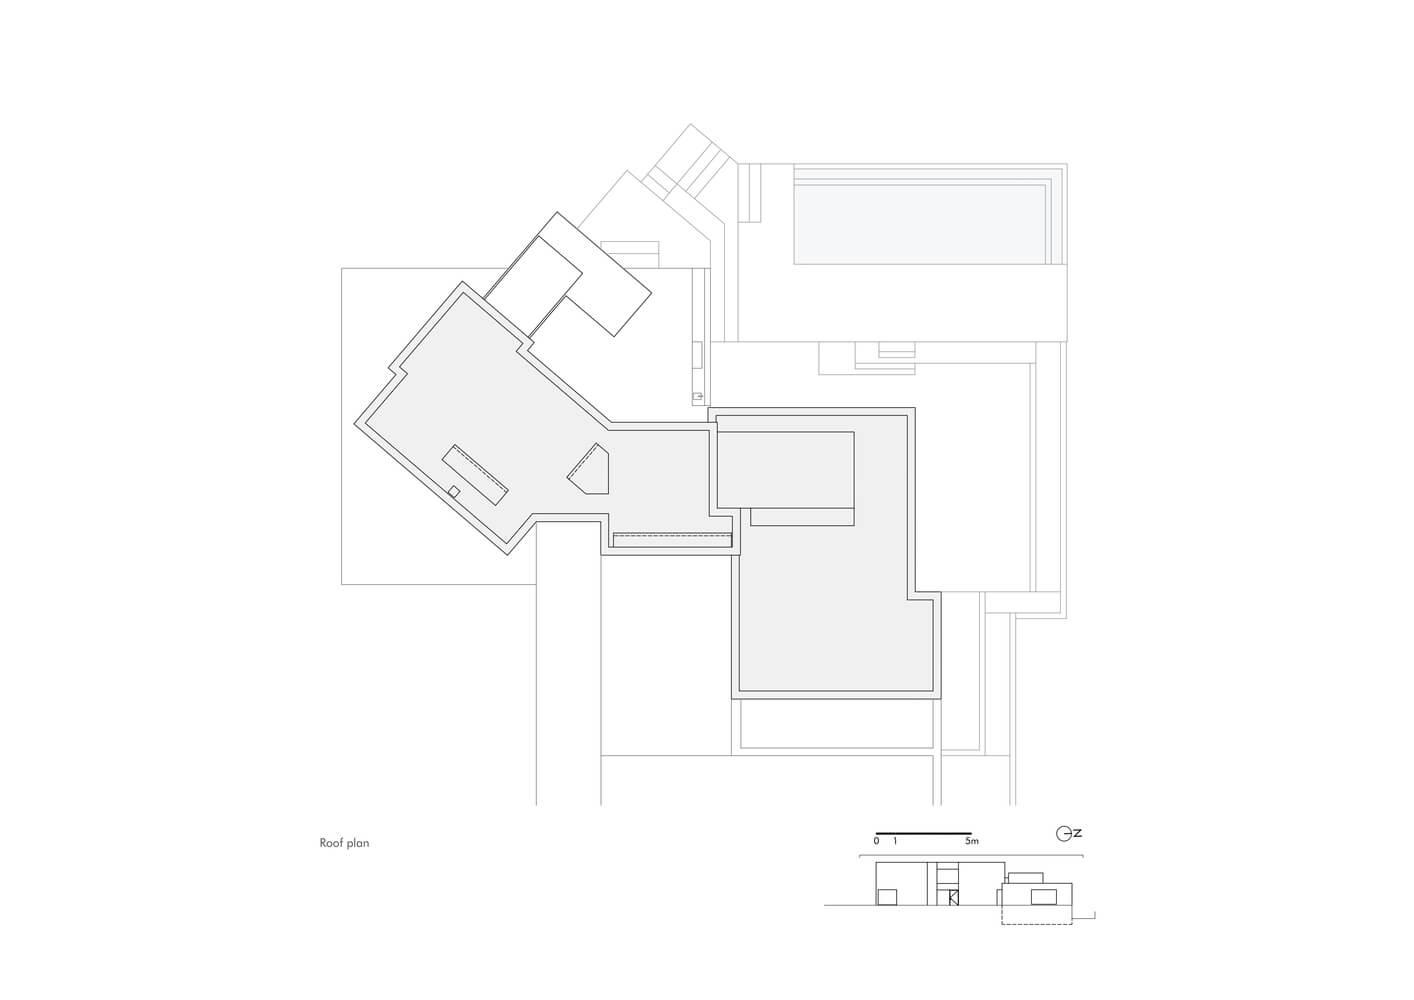 05 roof plan